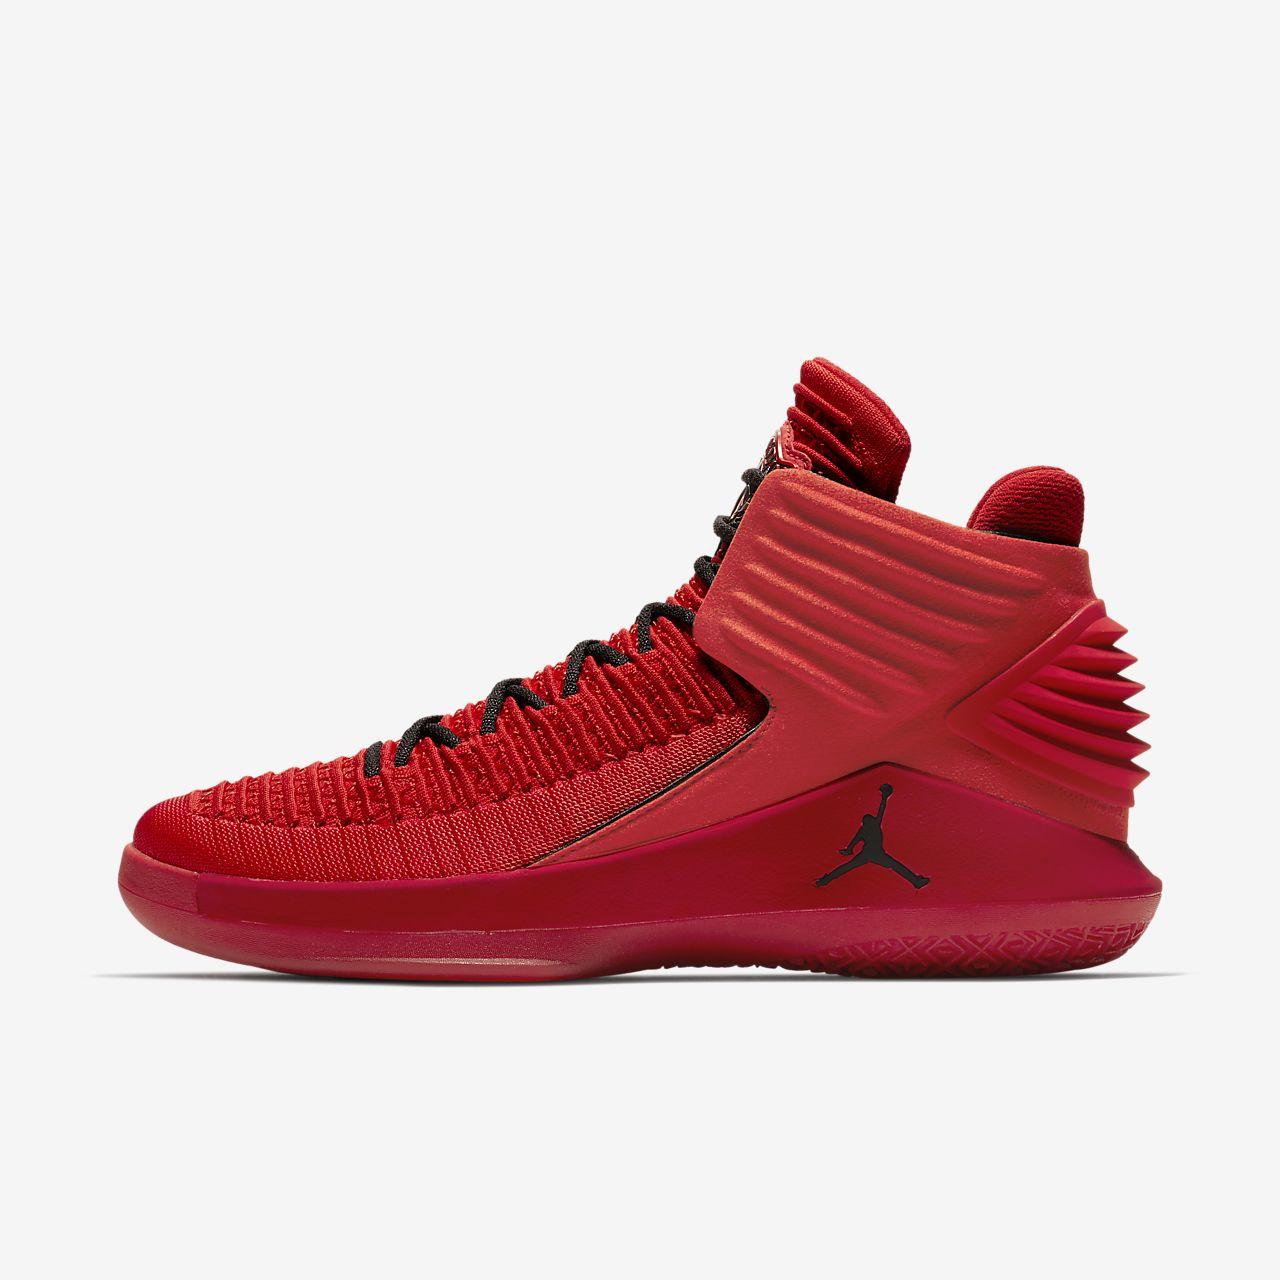 the latest 4783a e64d8 Schwarz Rosso Schuhe Air Jordan 32 Xxxii Corsa Aa1253 601 Basketball Gym Rot